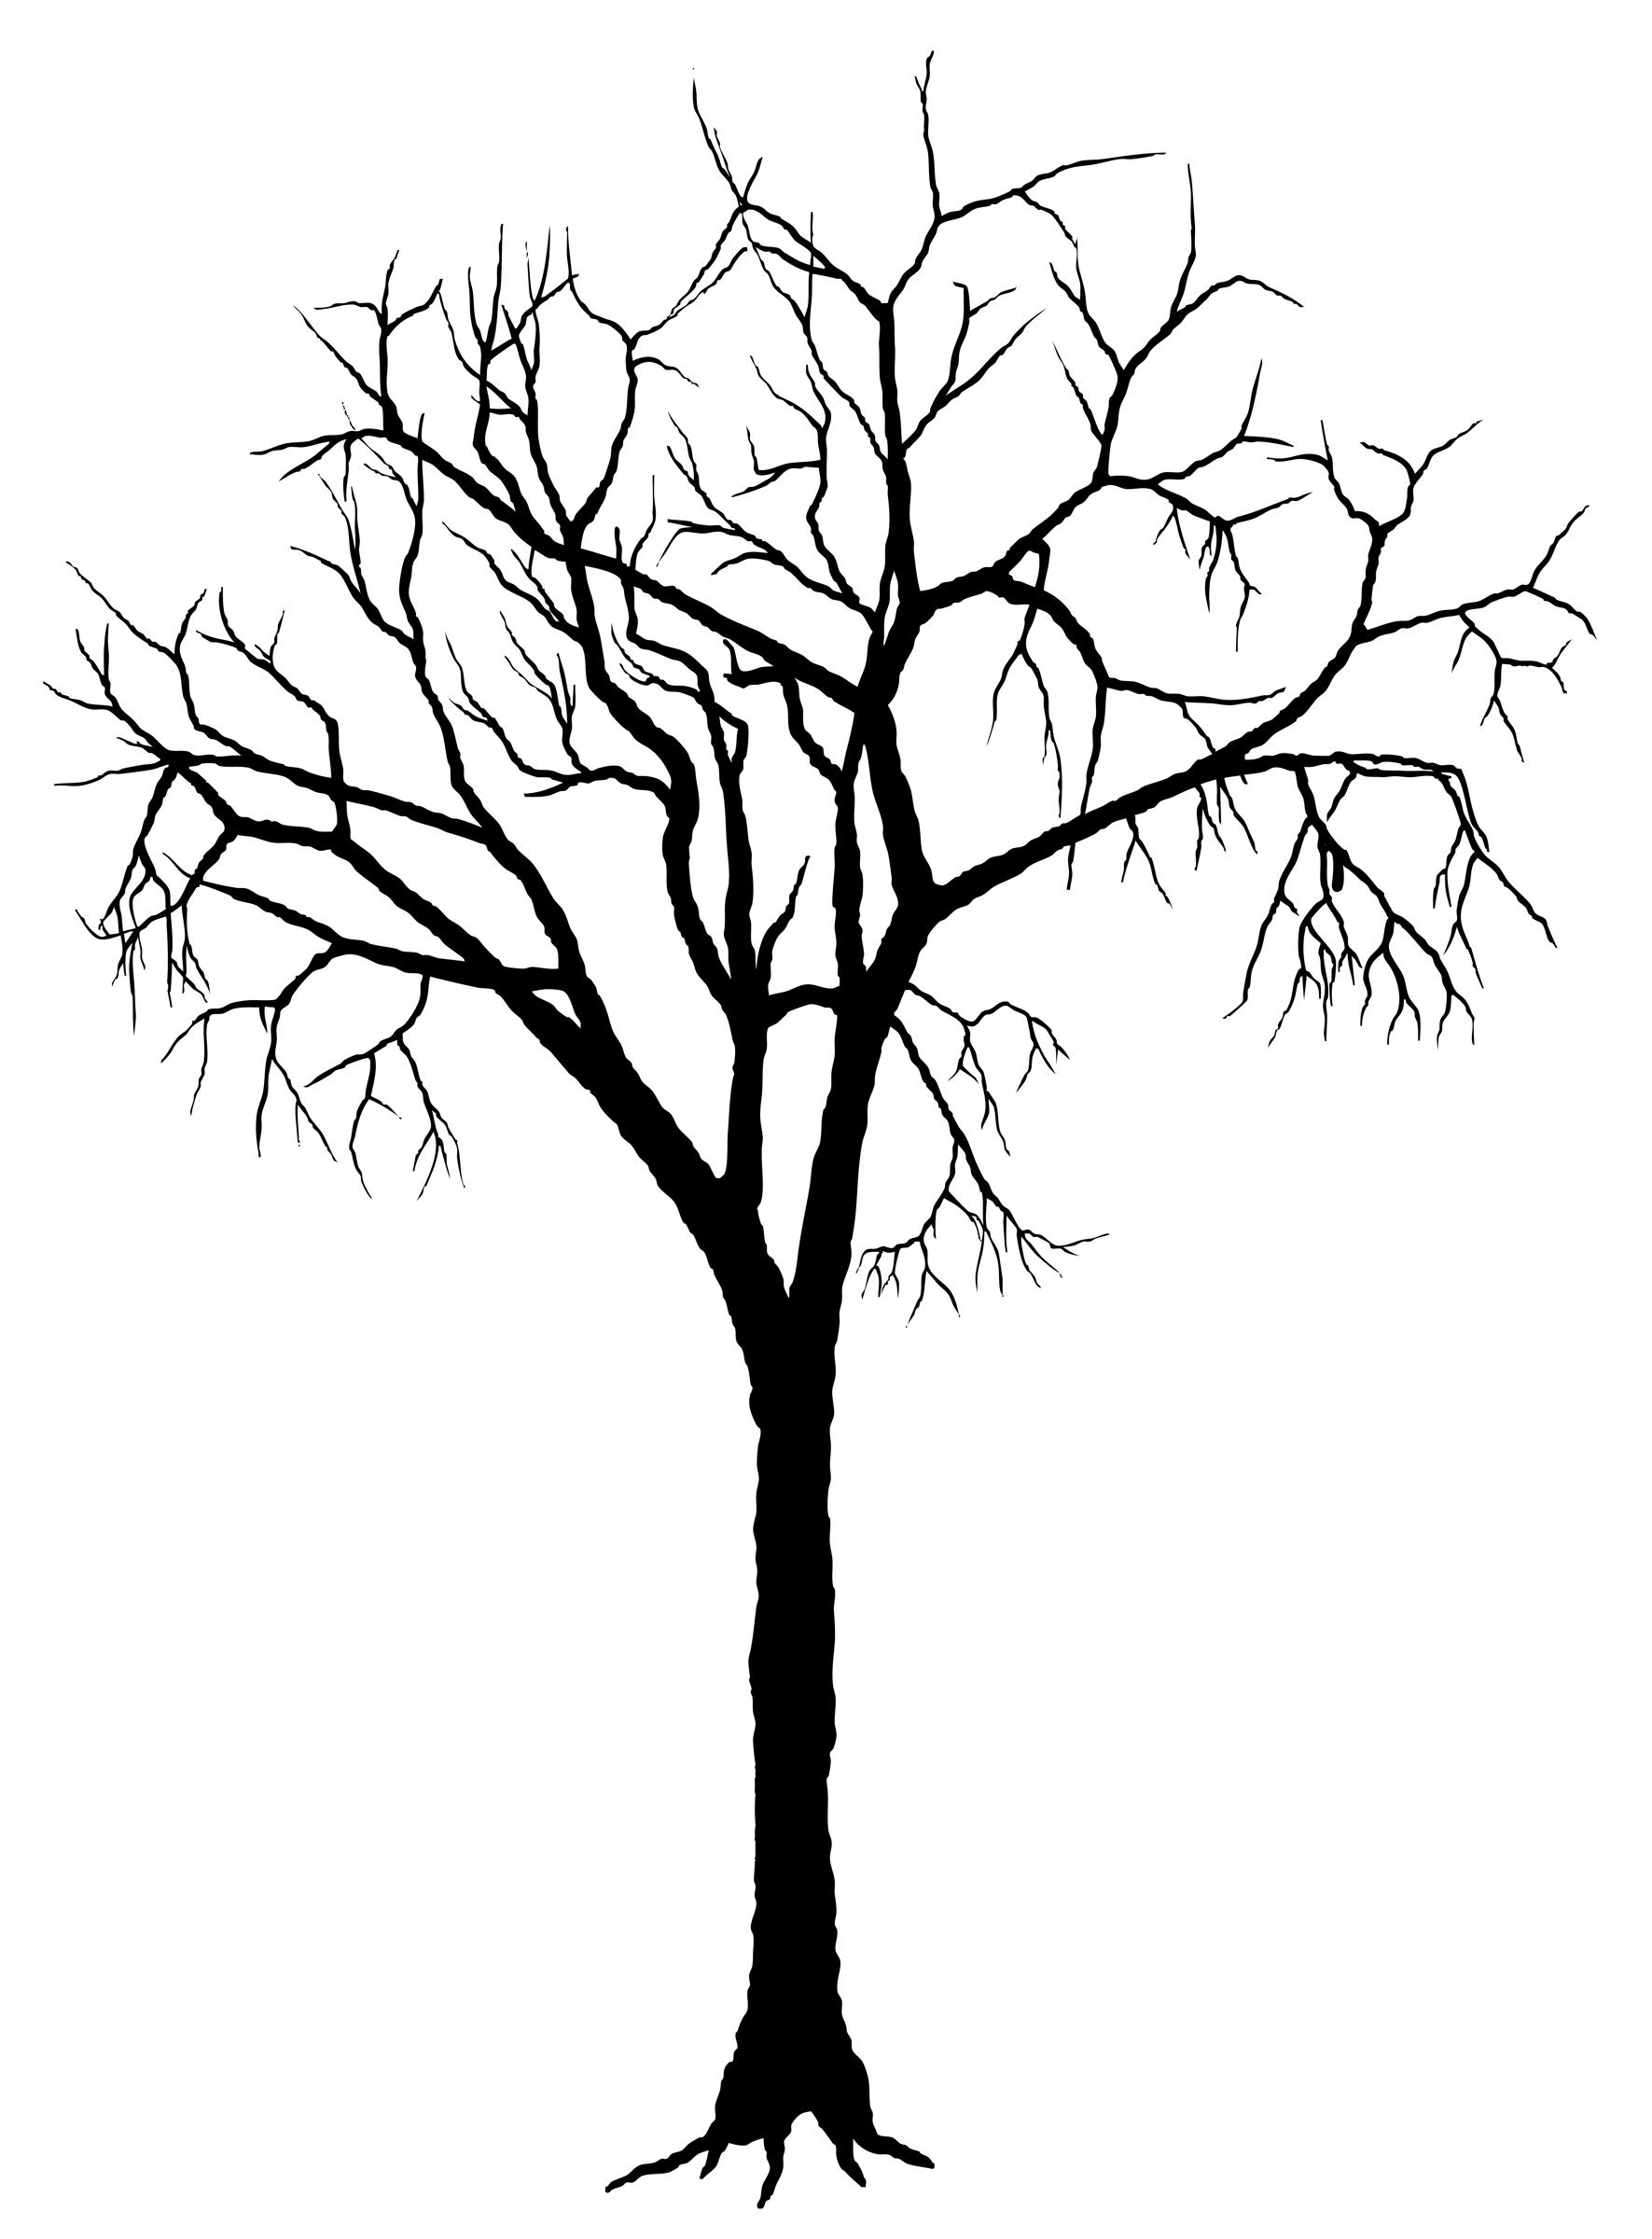 Silhouette Of Trees ClipArt Best Wallflower